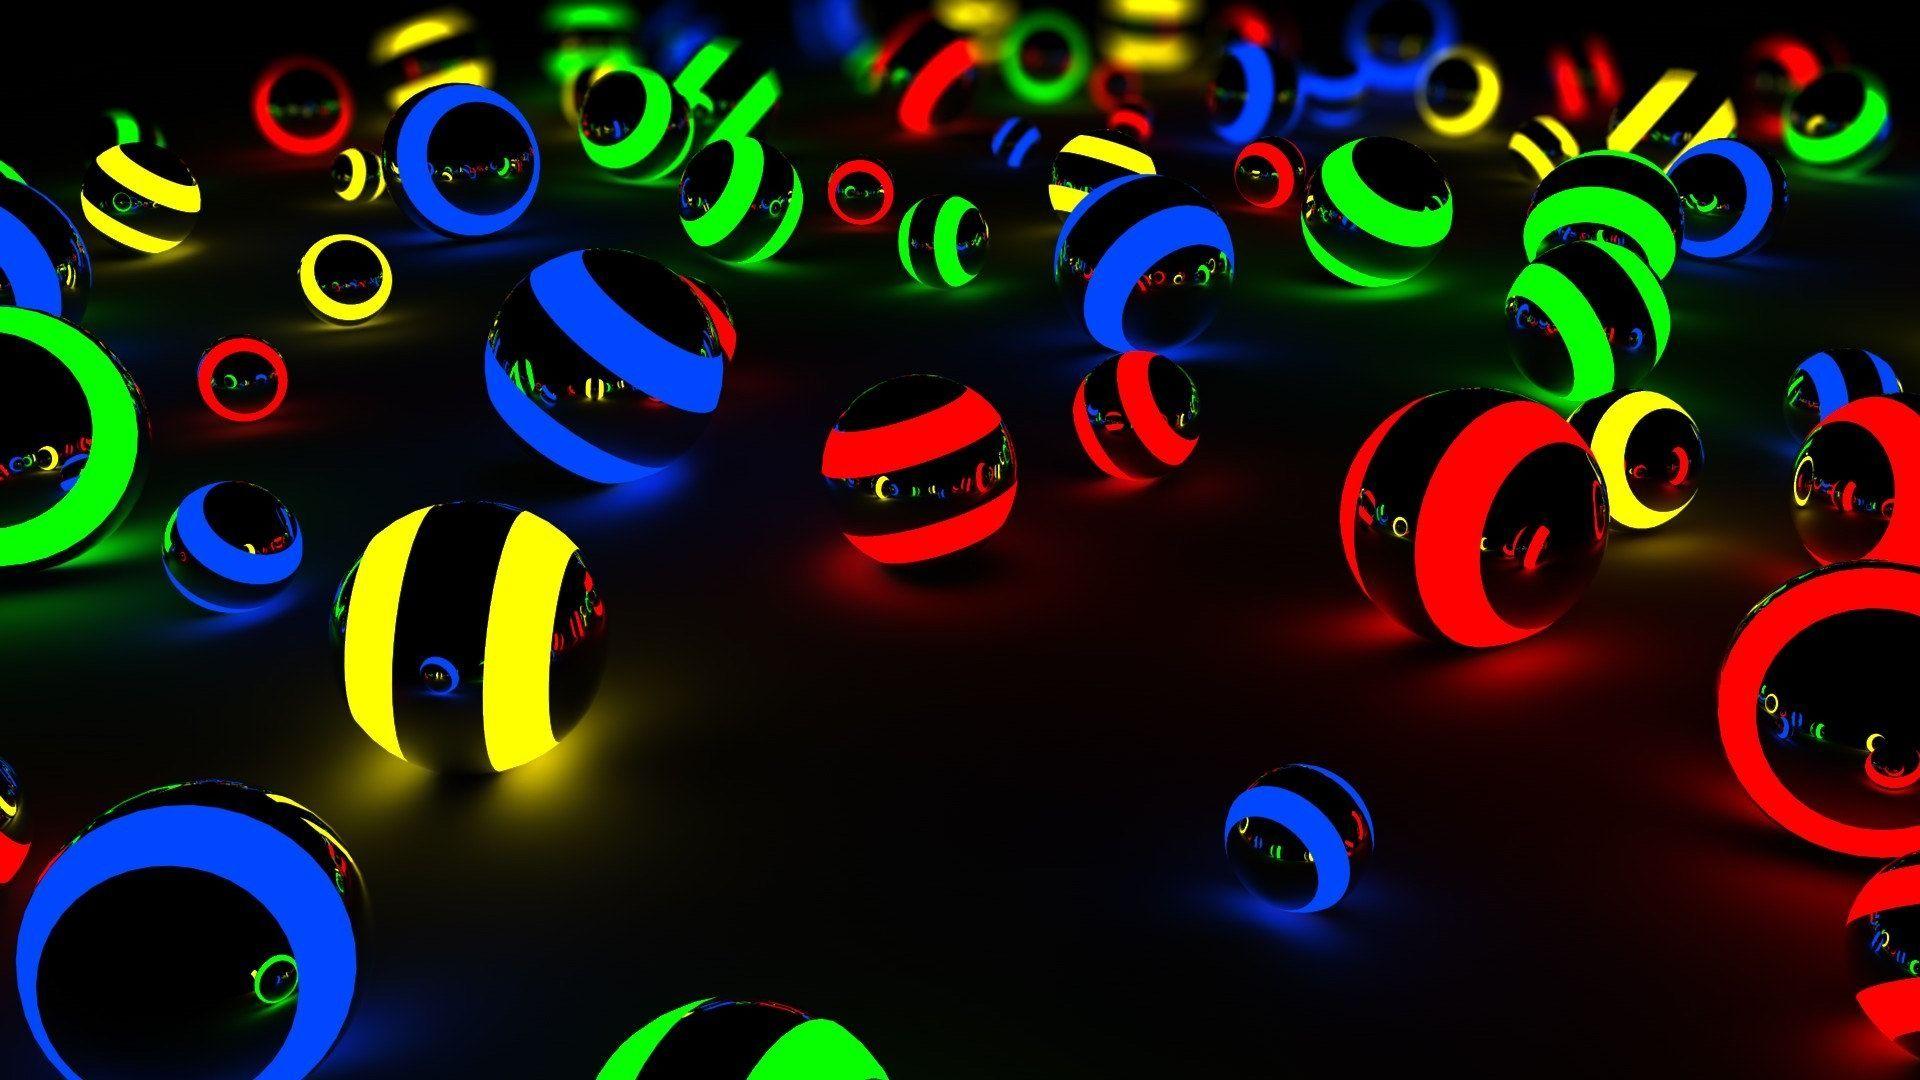 1479148058 836 Balls Hd Wallpapers Jpg 1920 1080 Neon Wallpaper Abstract Wallpaper Neon Backgrounds